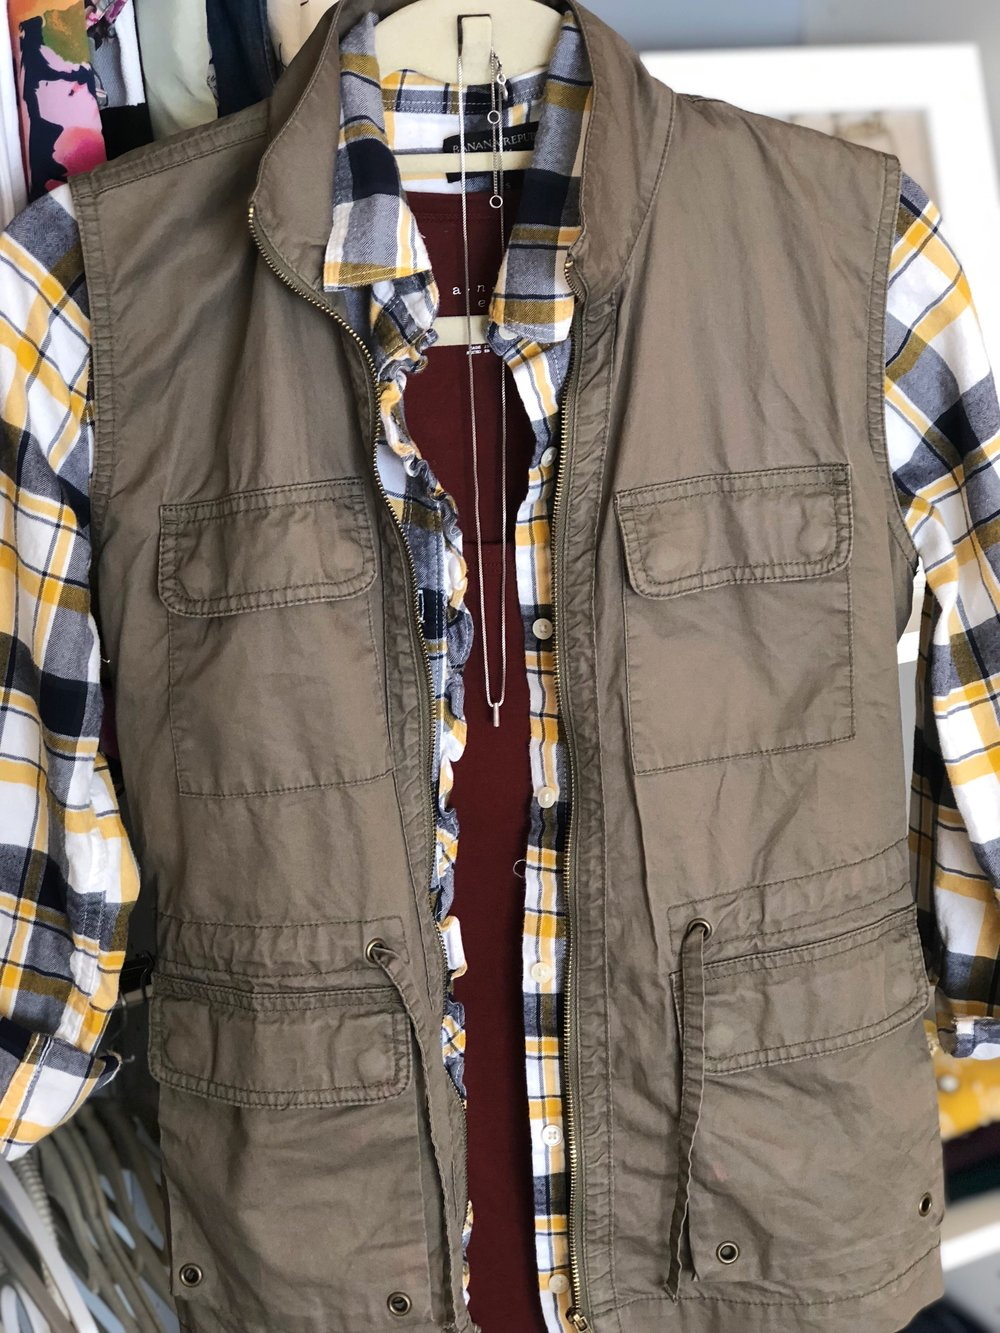 Six Ways to Style a Vest - Sandi Mele Personal Stylist